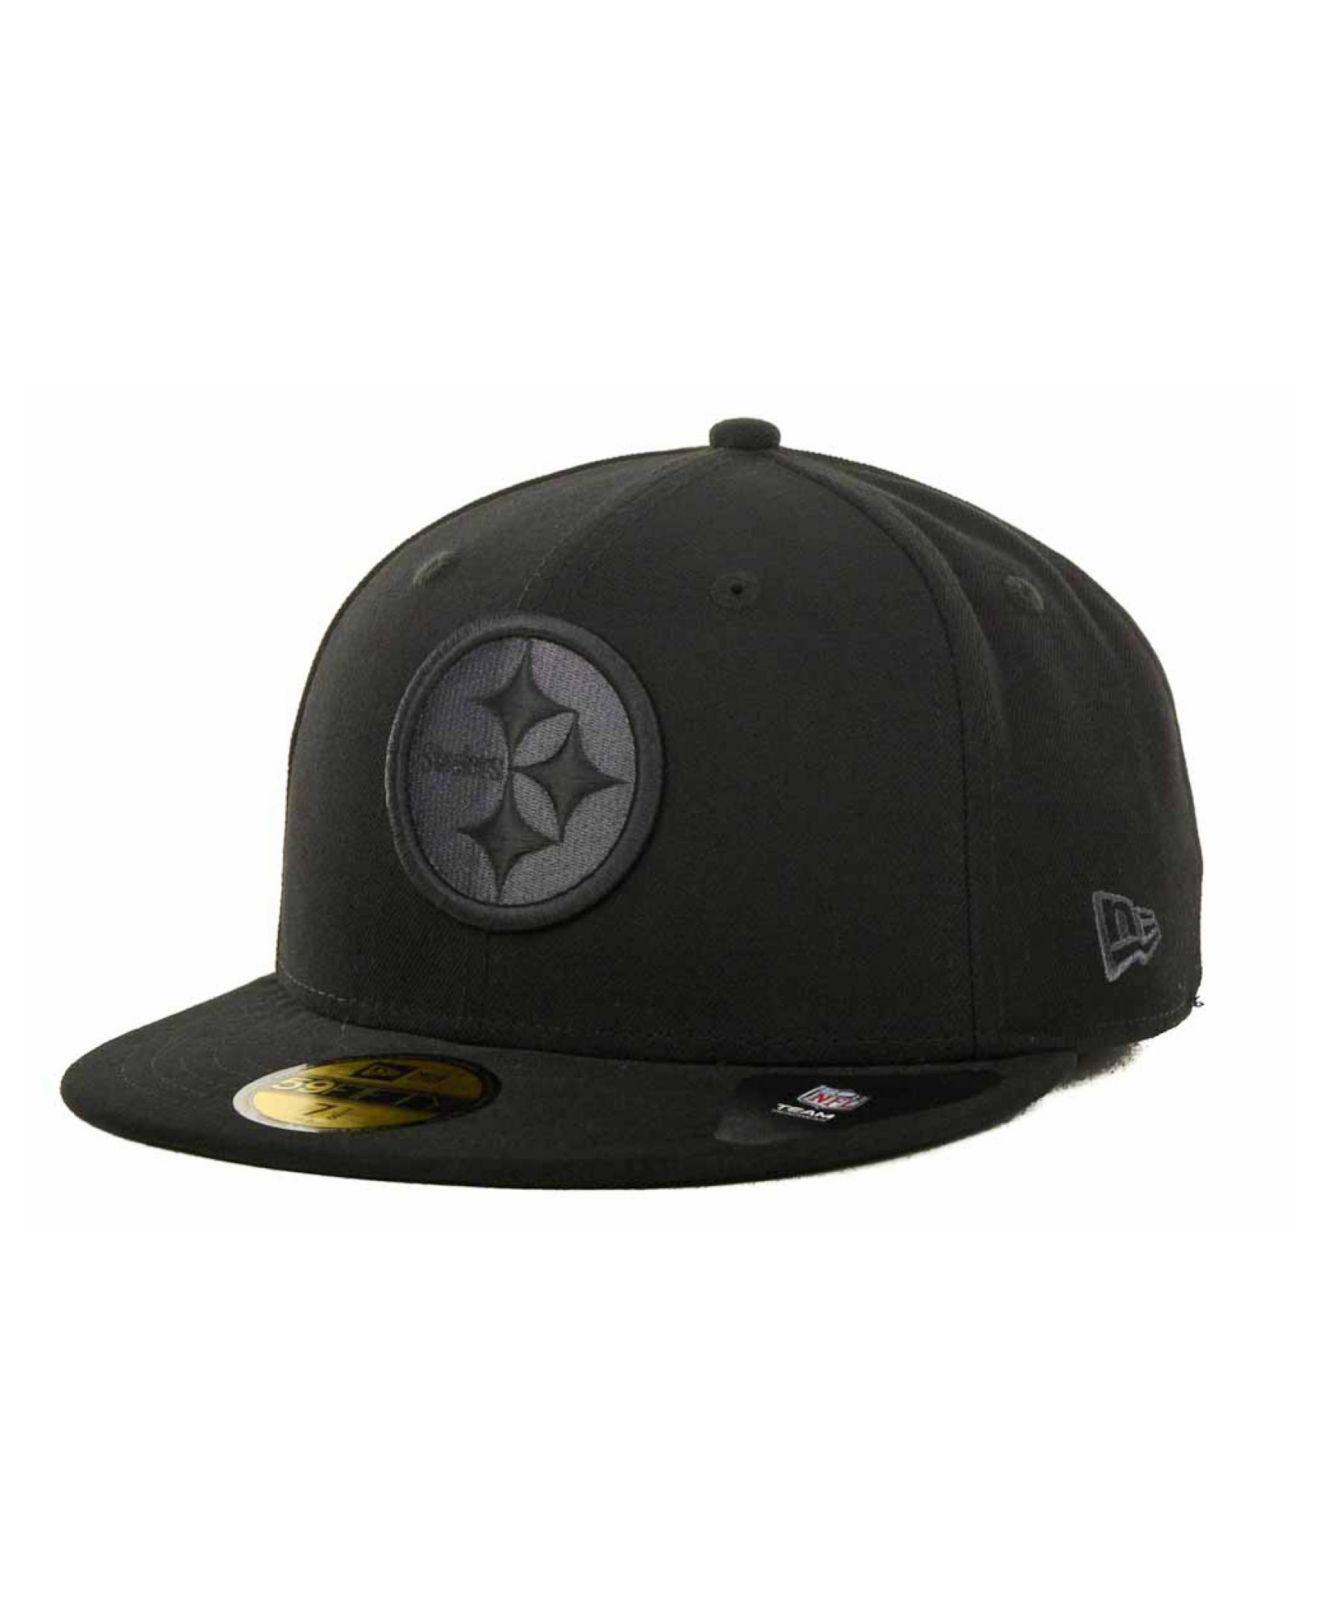 c4d77faa328 Lyst - KTZ Pittsburgh Steelers Black Gray 59fifty Hat in Black for Men